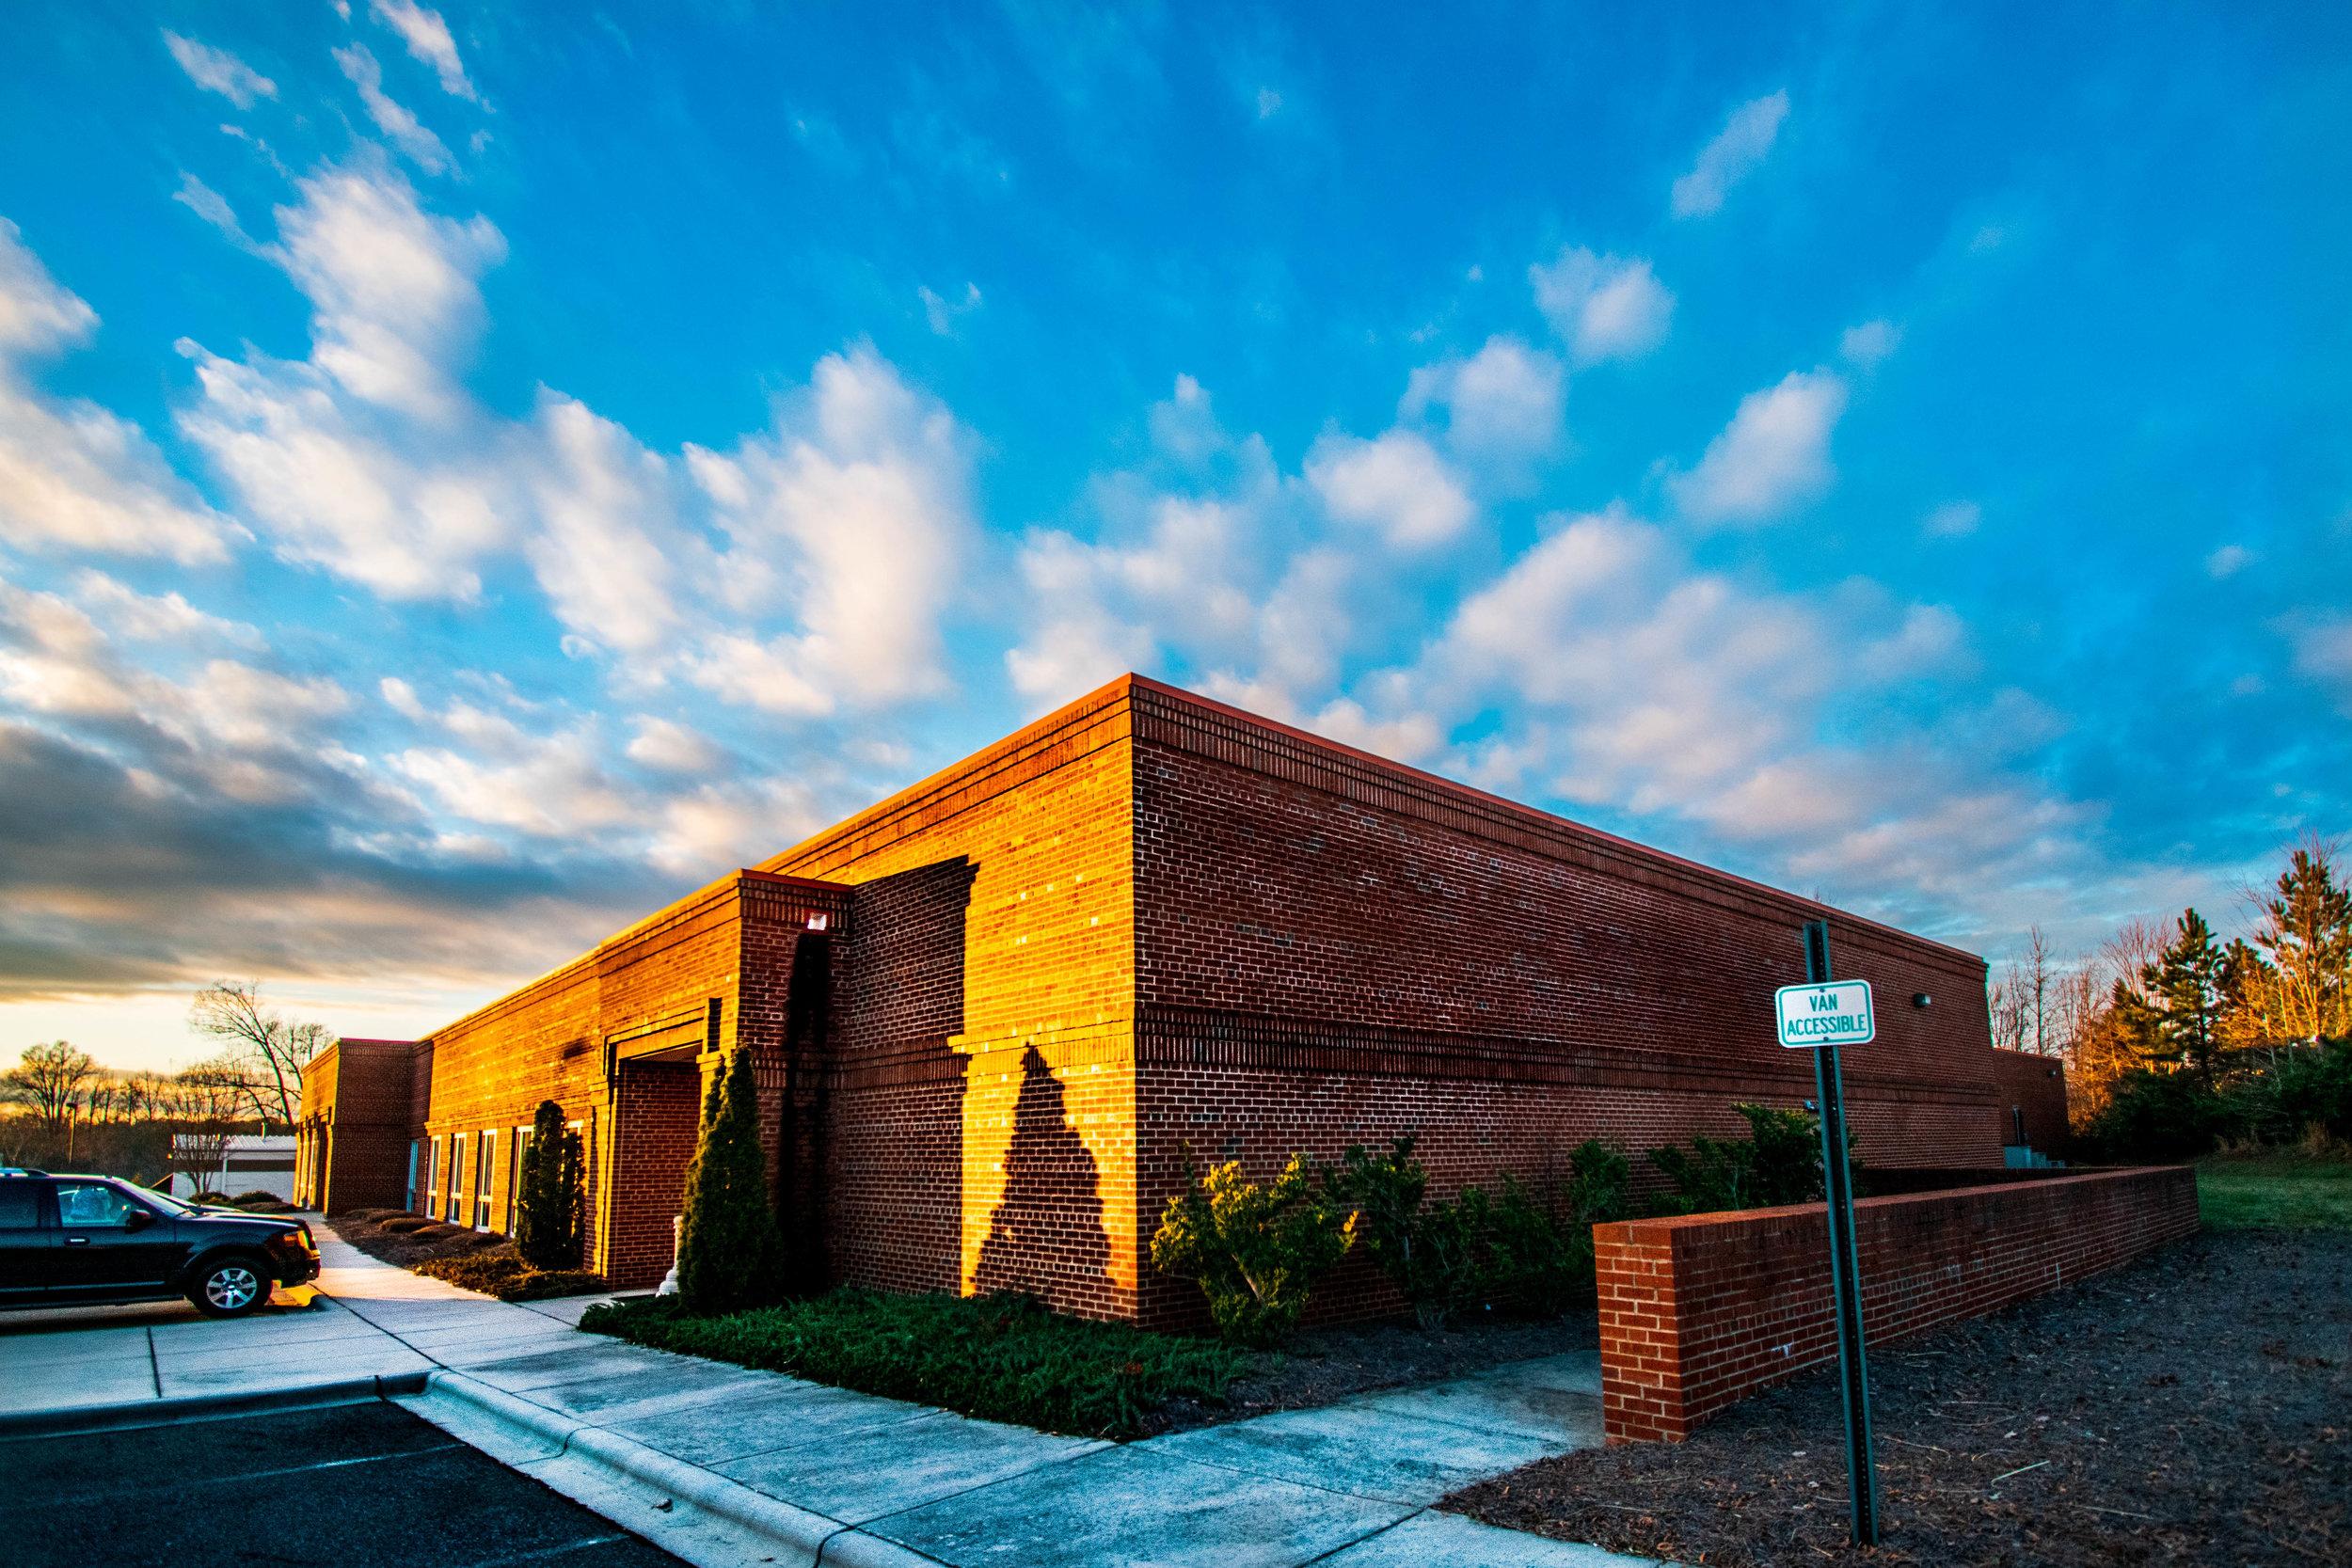 jenison-construction-design-build-mooresville-northcarolina.jpg